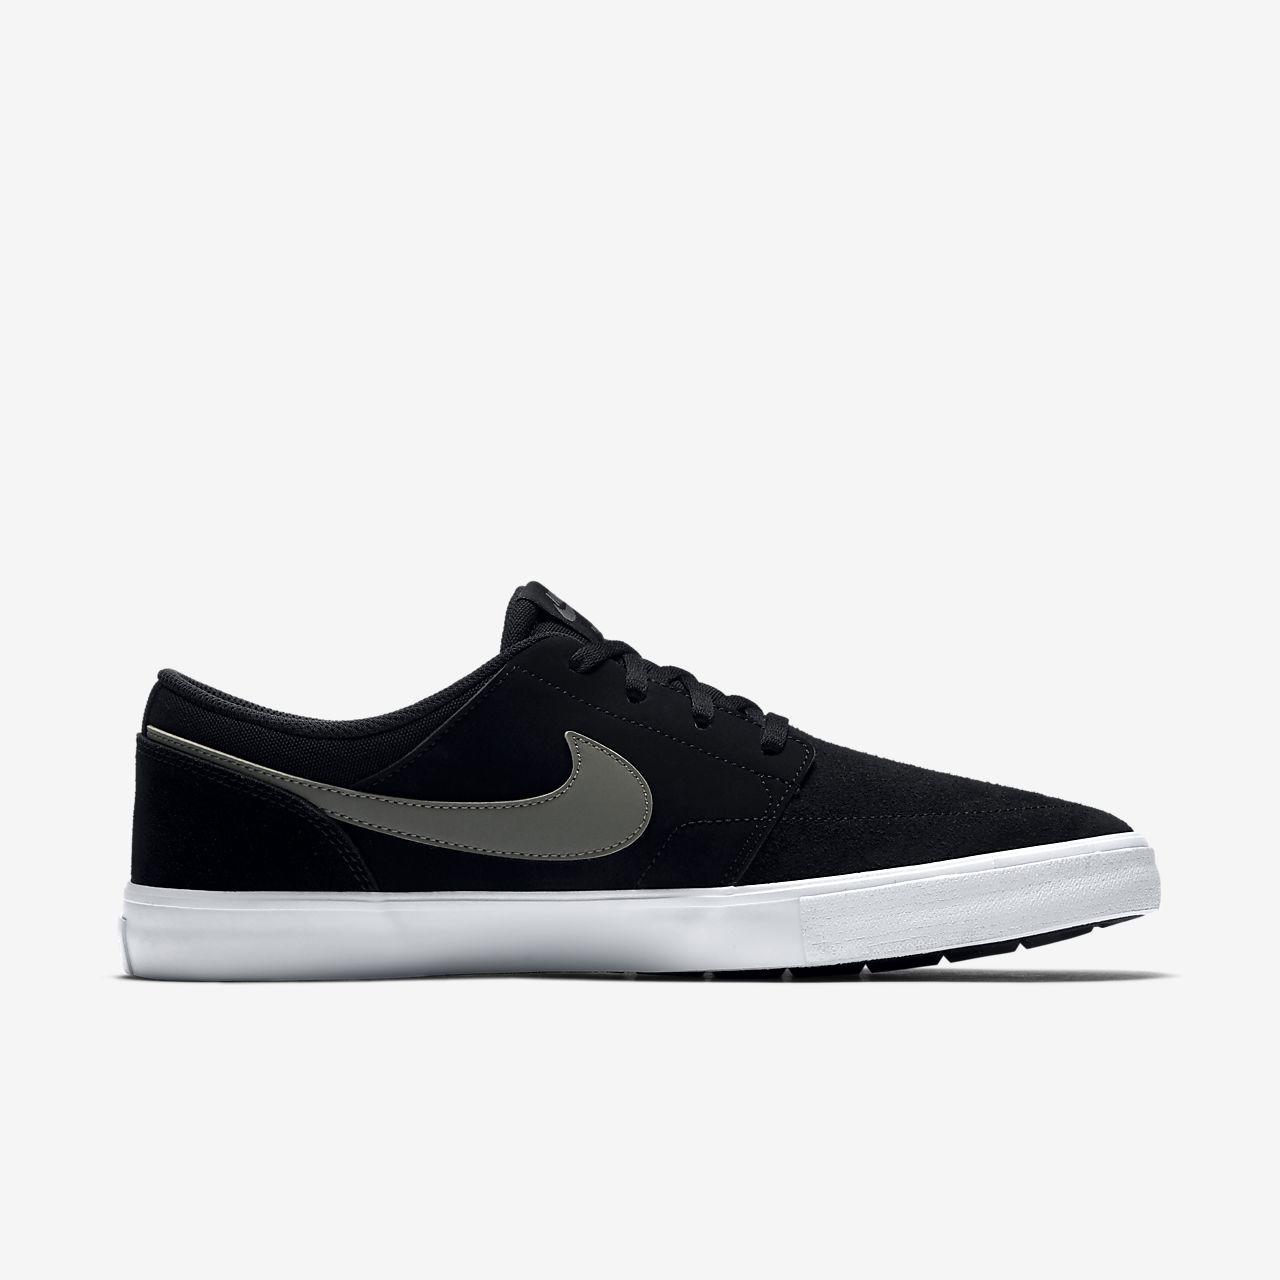 brand new 74eb6 9b245 ... Chaussure de skateboard Nike SB Solarsoft Portmore II pour Homme